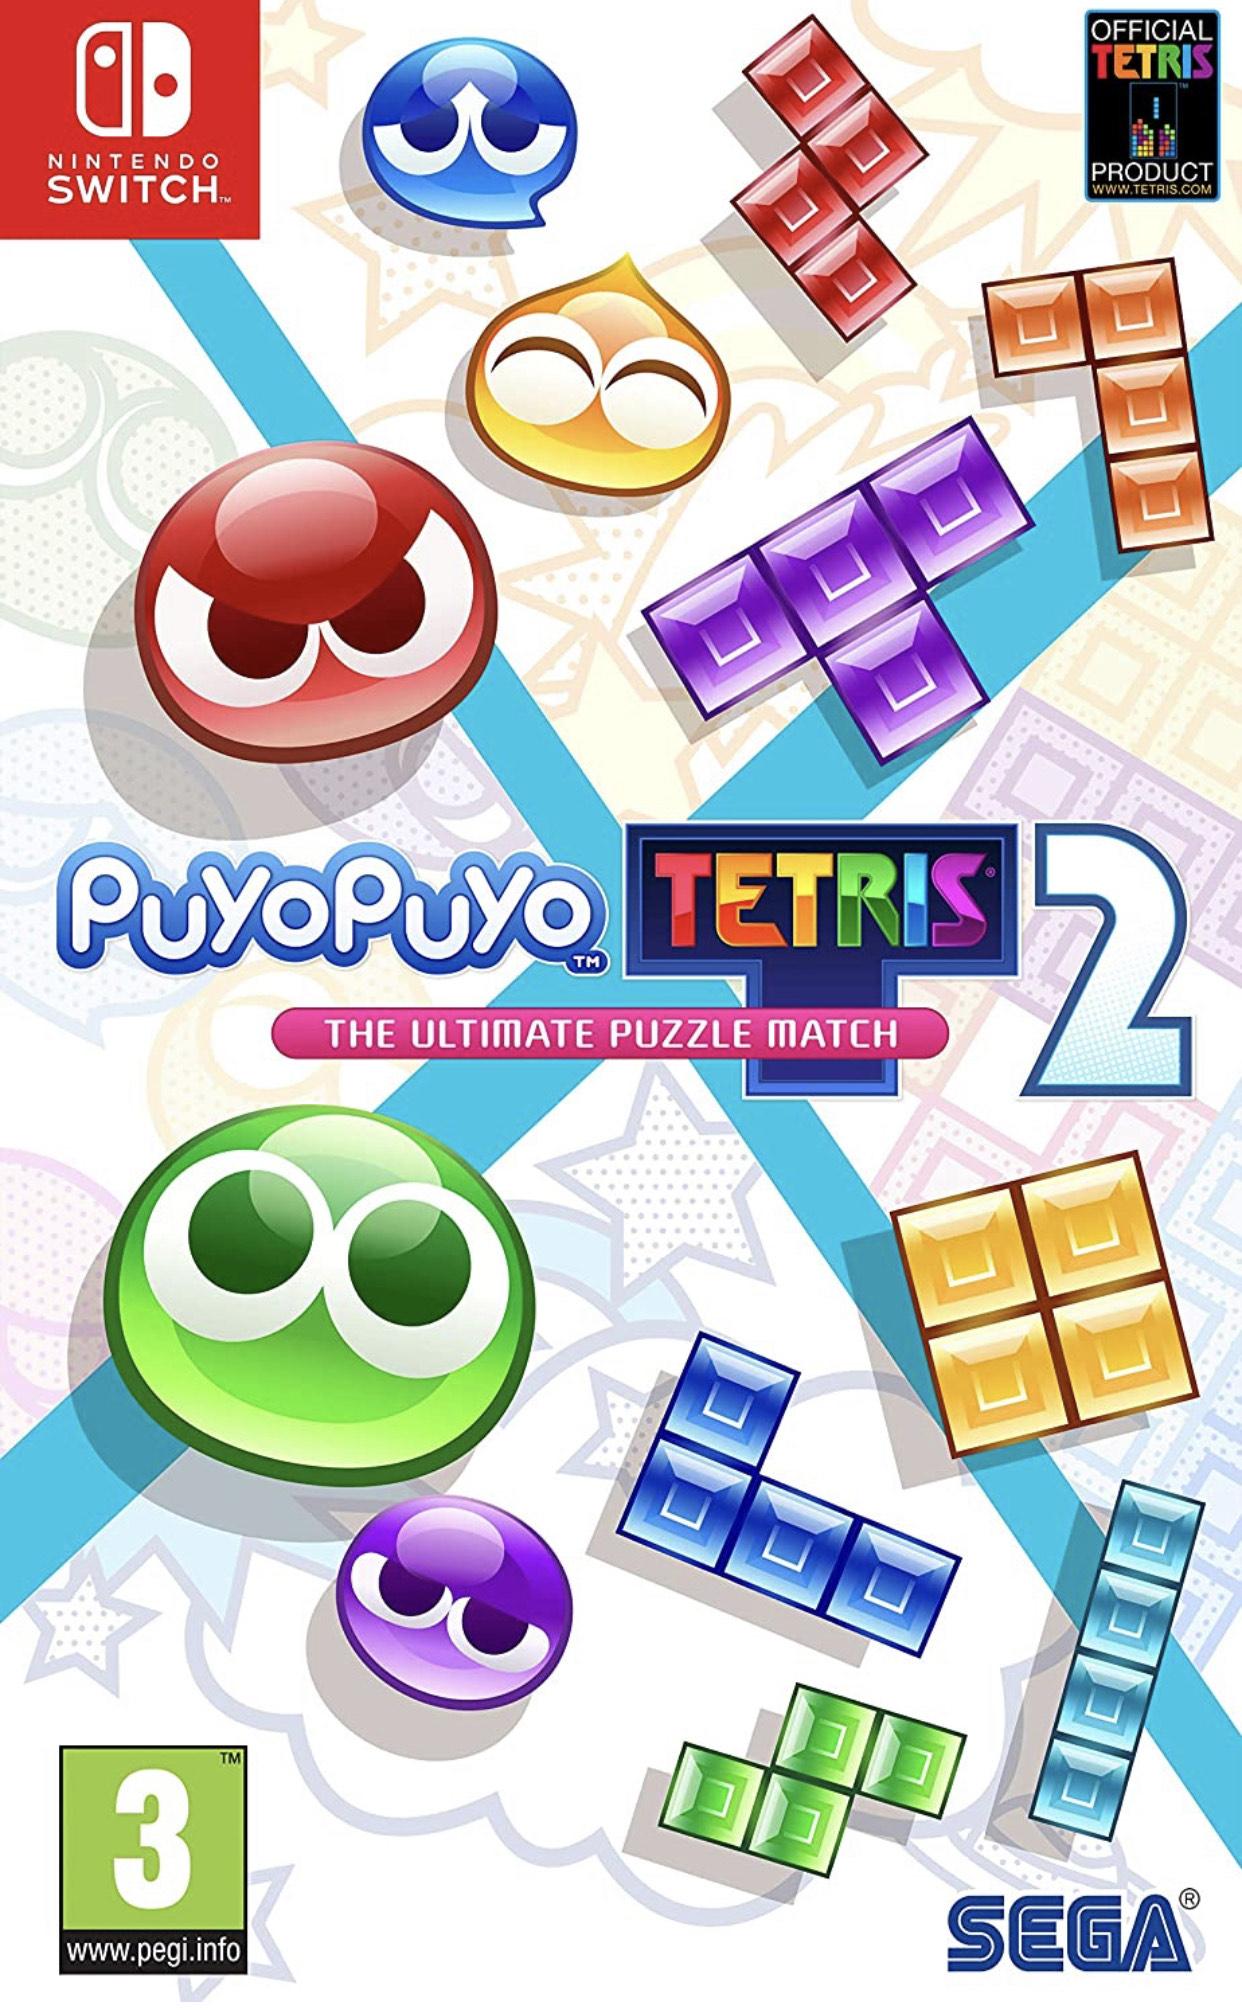 Puyo Puyo Tetris 2 (Nintendo Switch) - £22.99 @ The Game Collection